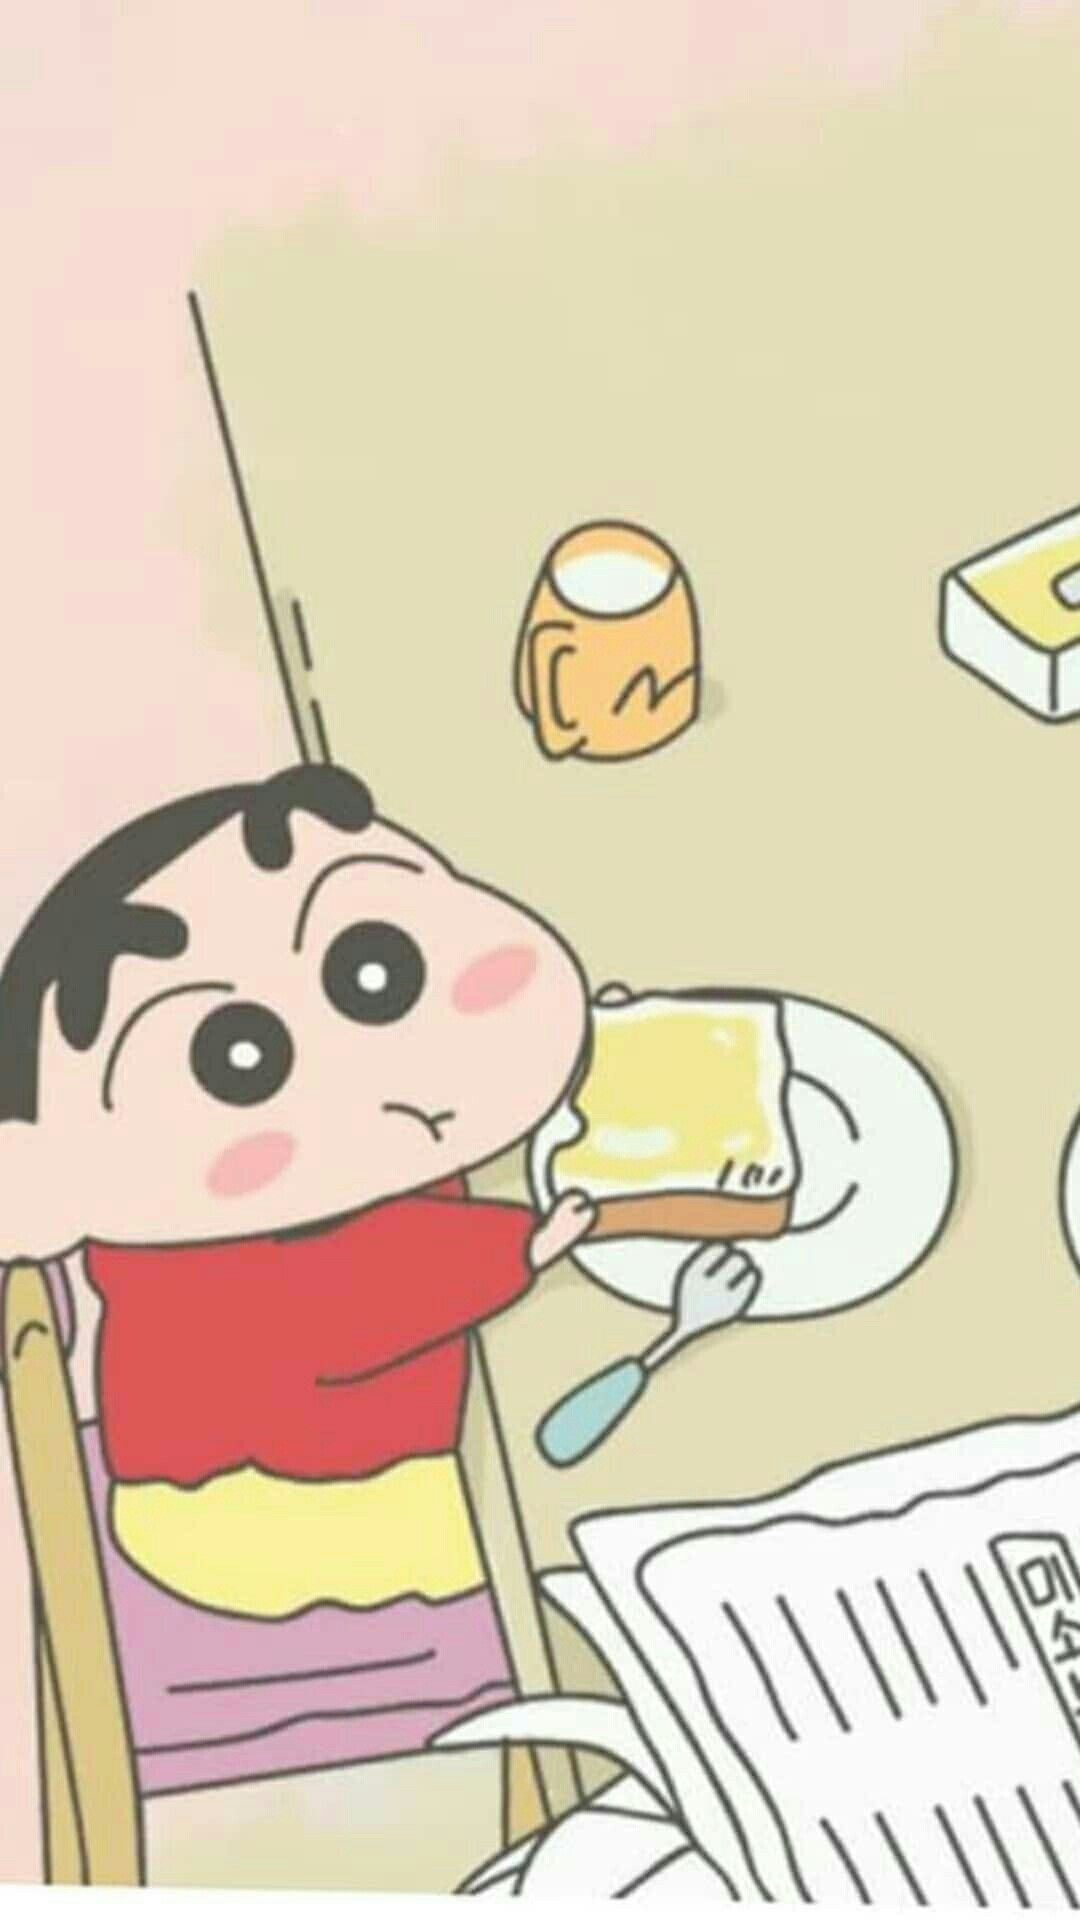 pin by pinecone on shinchan funny phone wallpaper cartoon wallpaper cute cartoon wallpapers